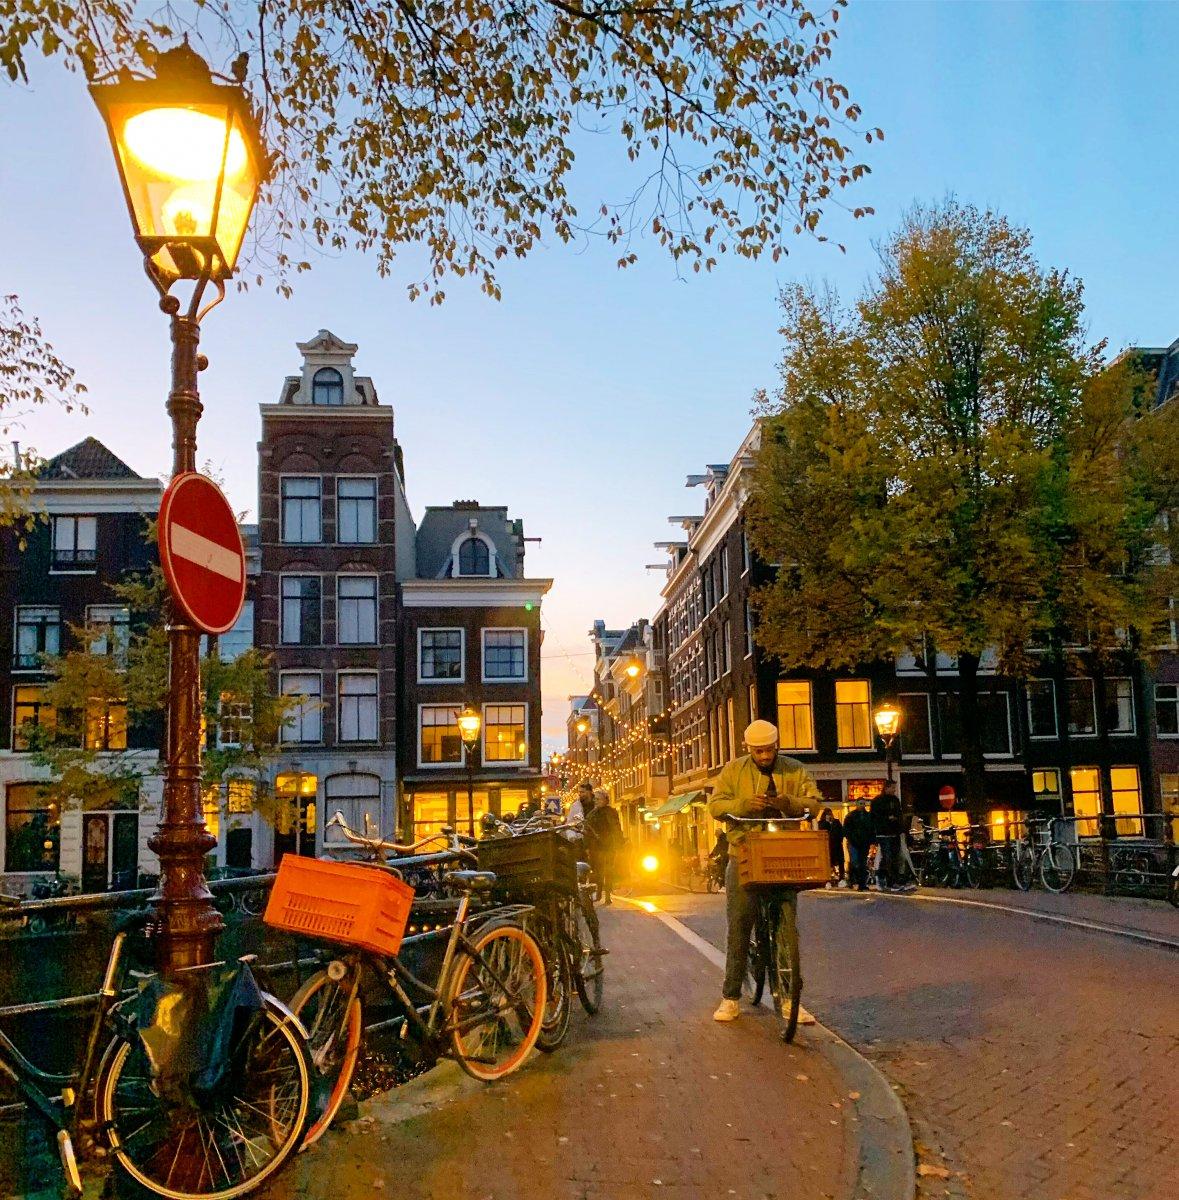 Инста-прогулка по романтичному и тихому Амстердаму